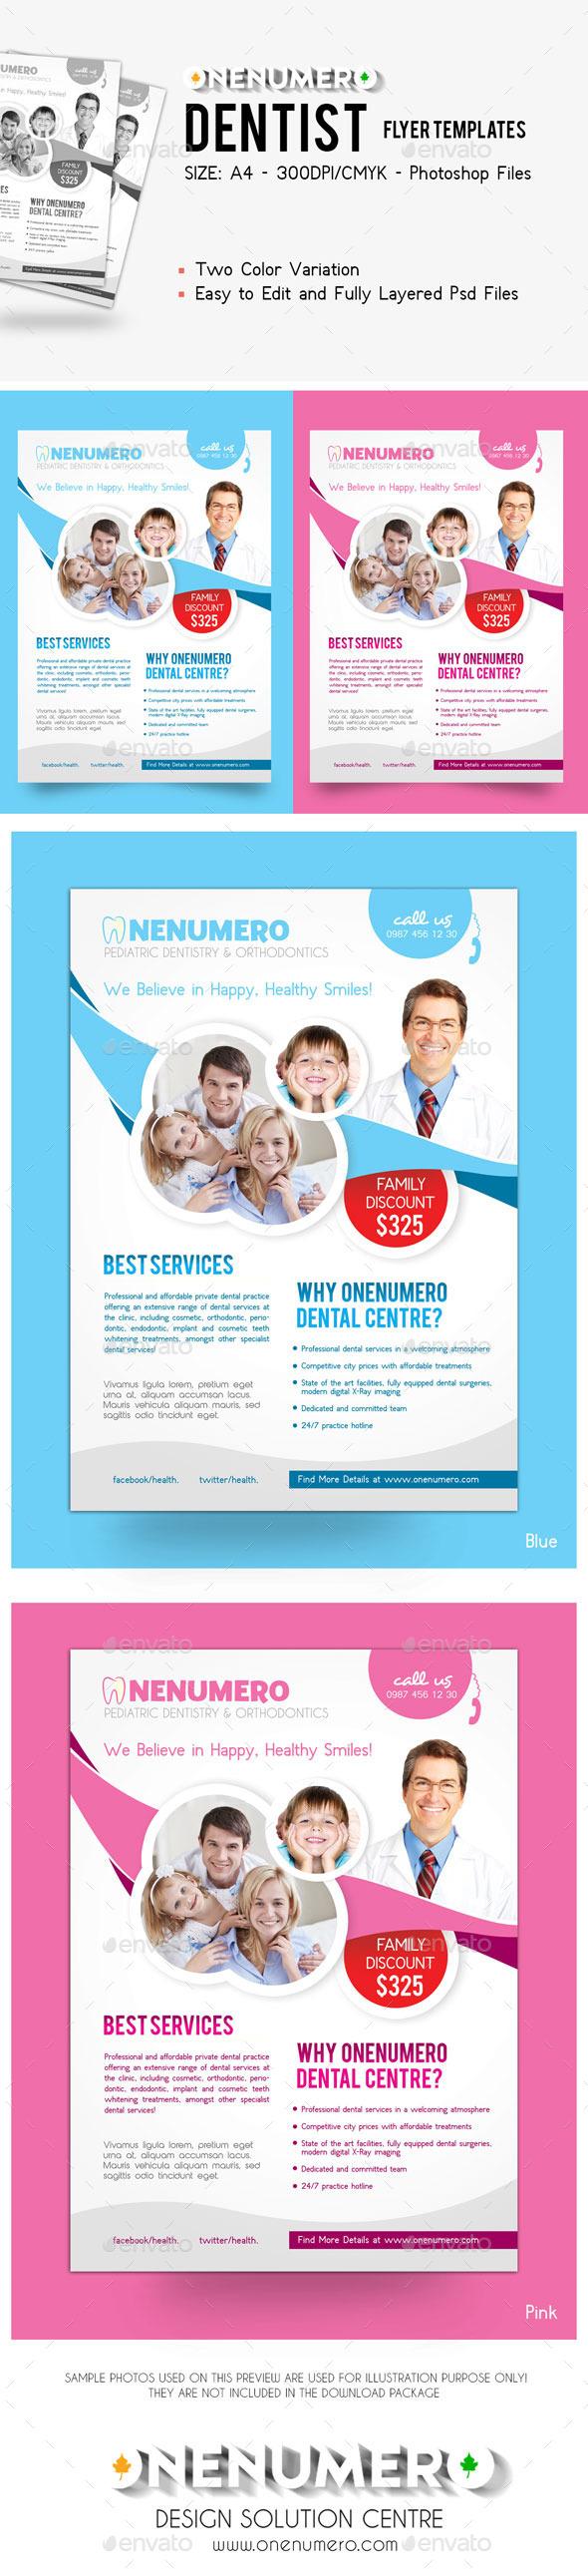 GraphicRiver Dentist Flyer Template 9020898